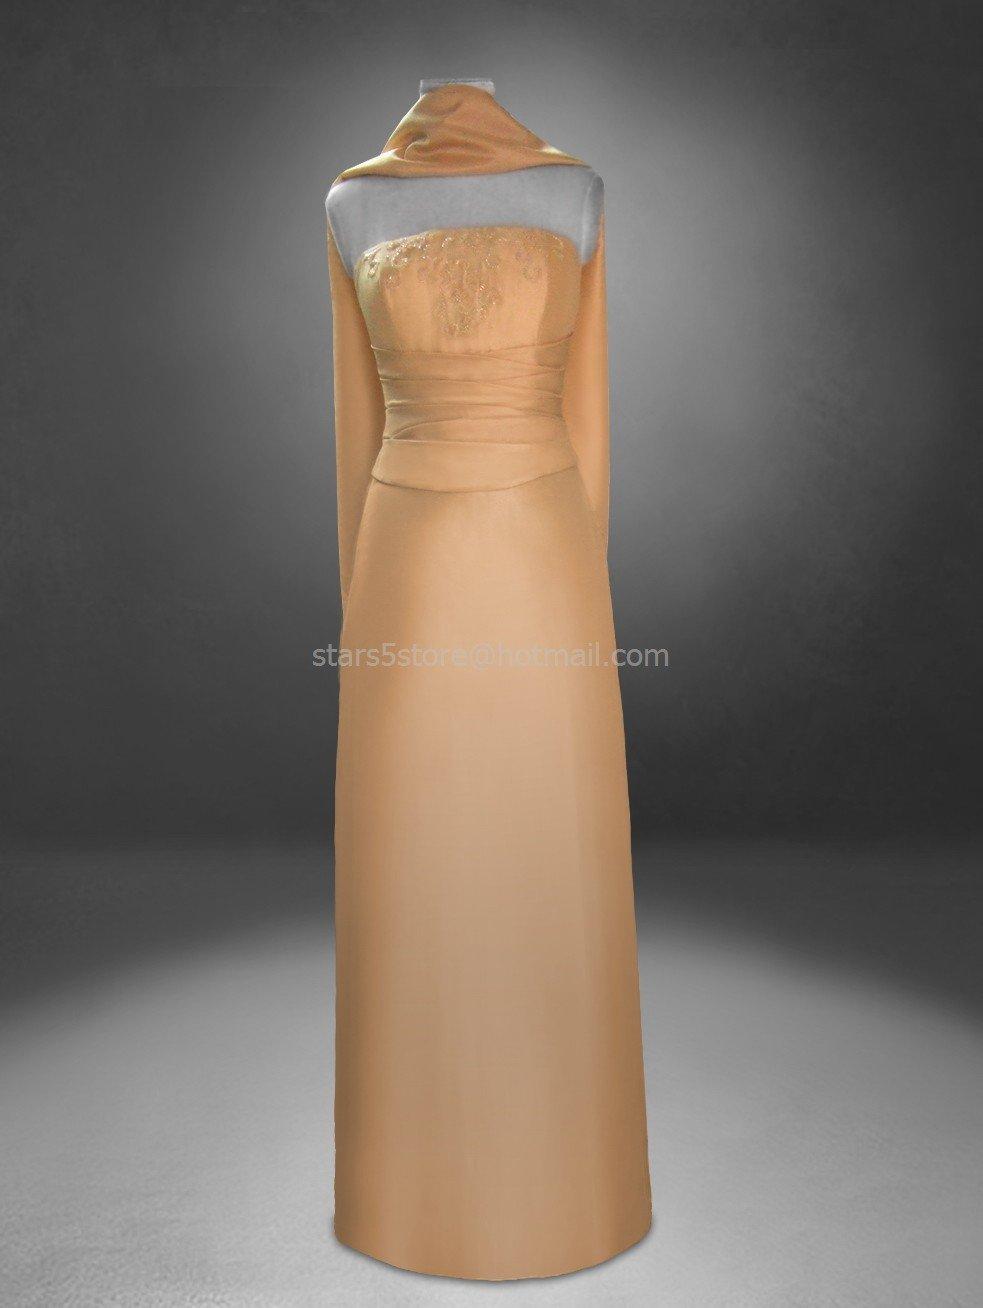 Gold Satin Mother of the Bride Dress Custom Strapless Sheath Free Shawl Wedding Formal Dress Mm03